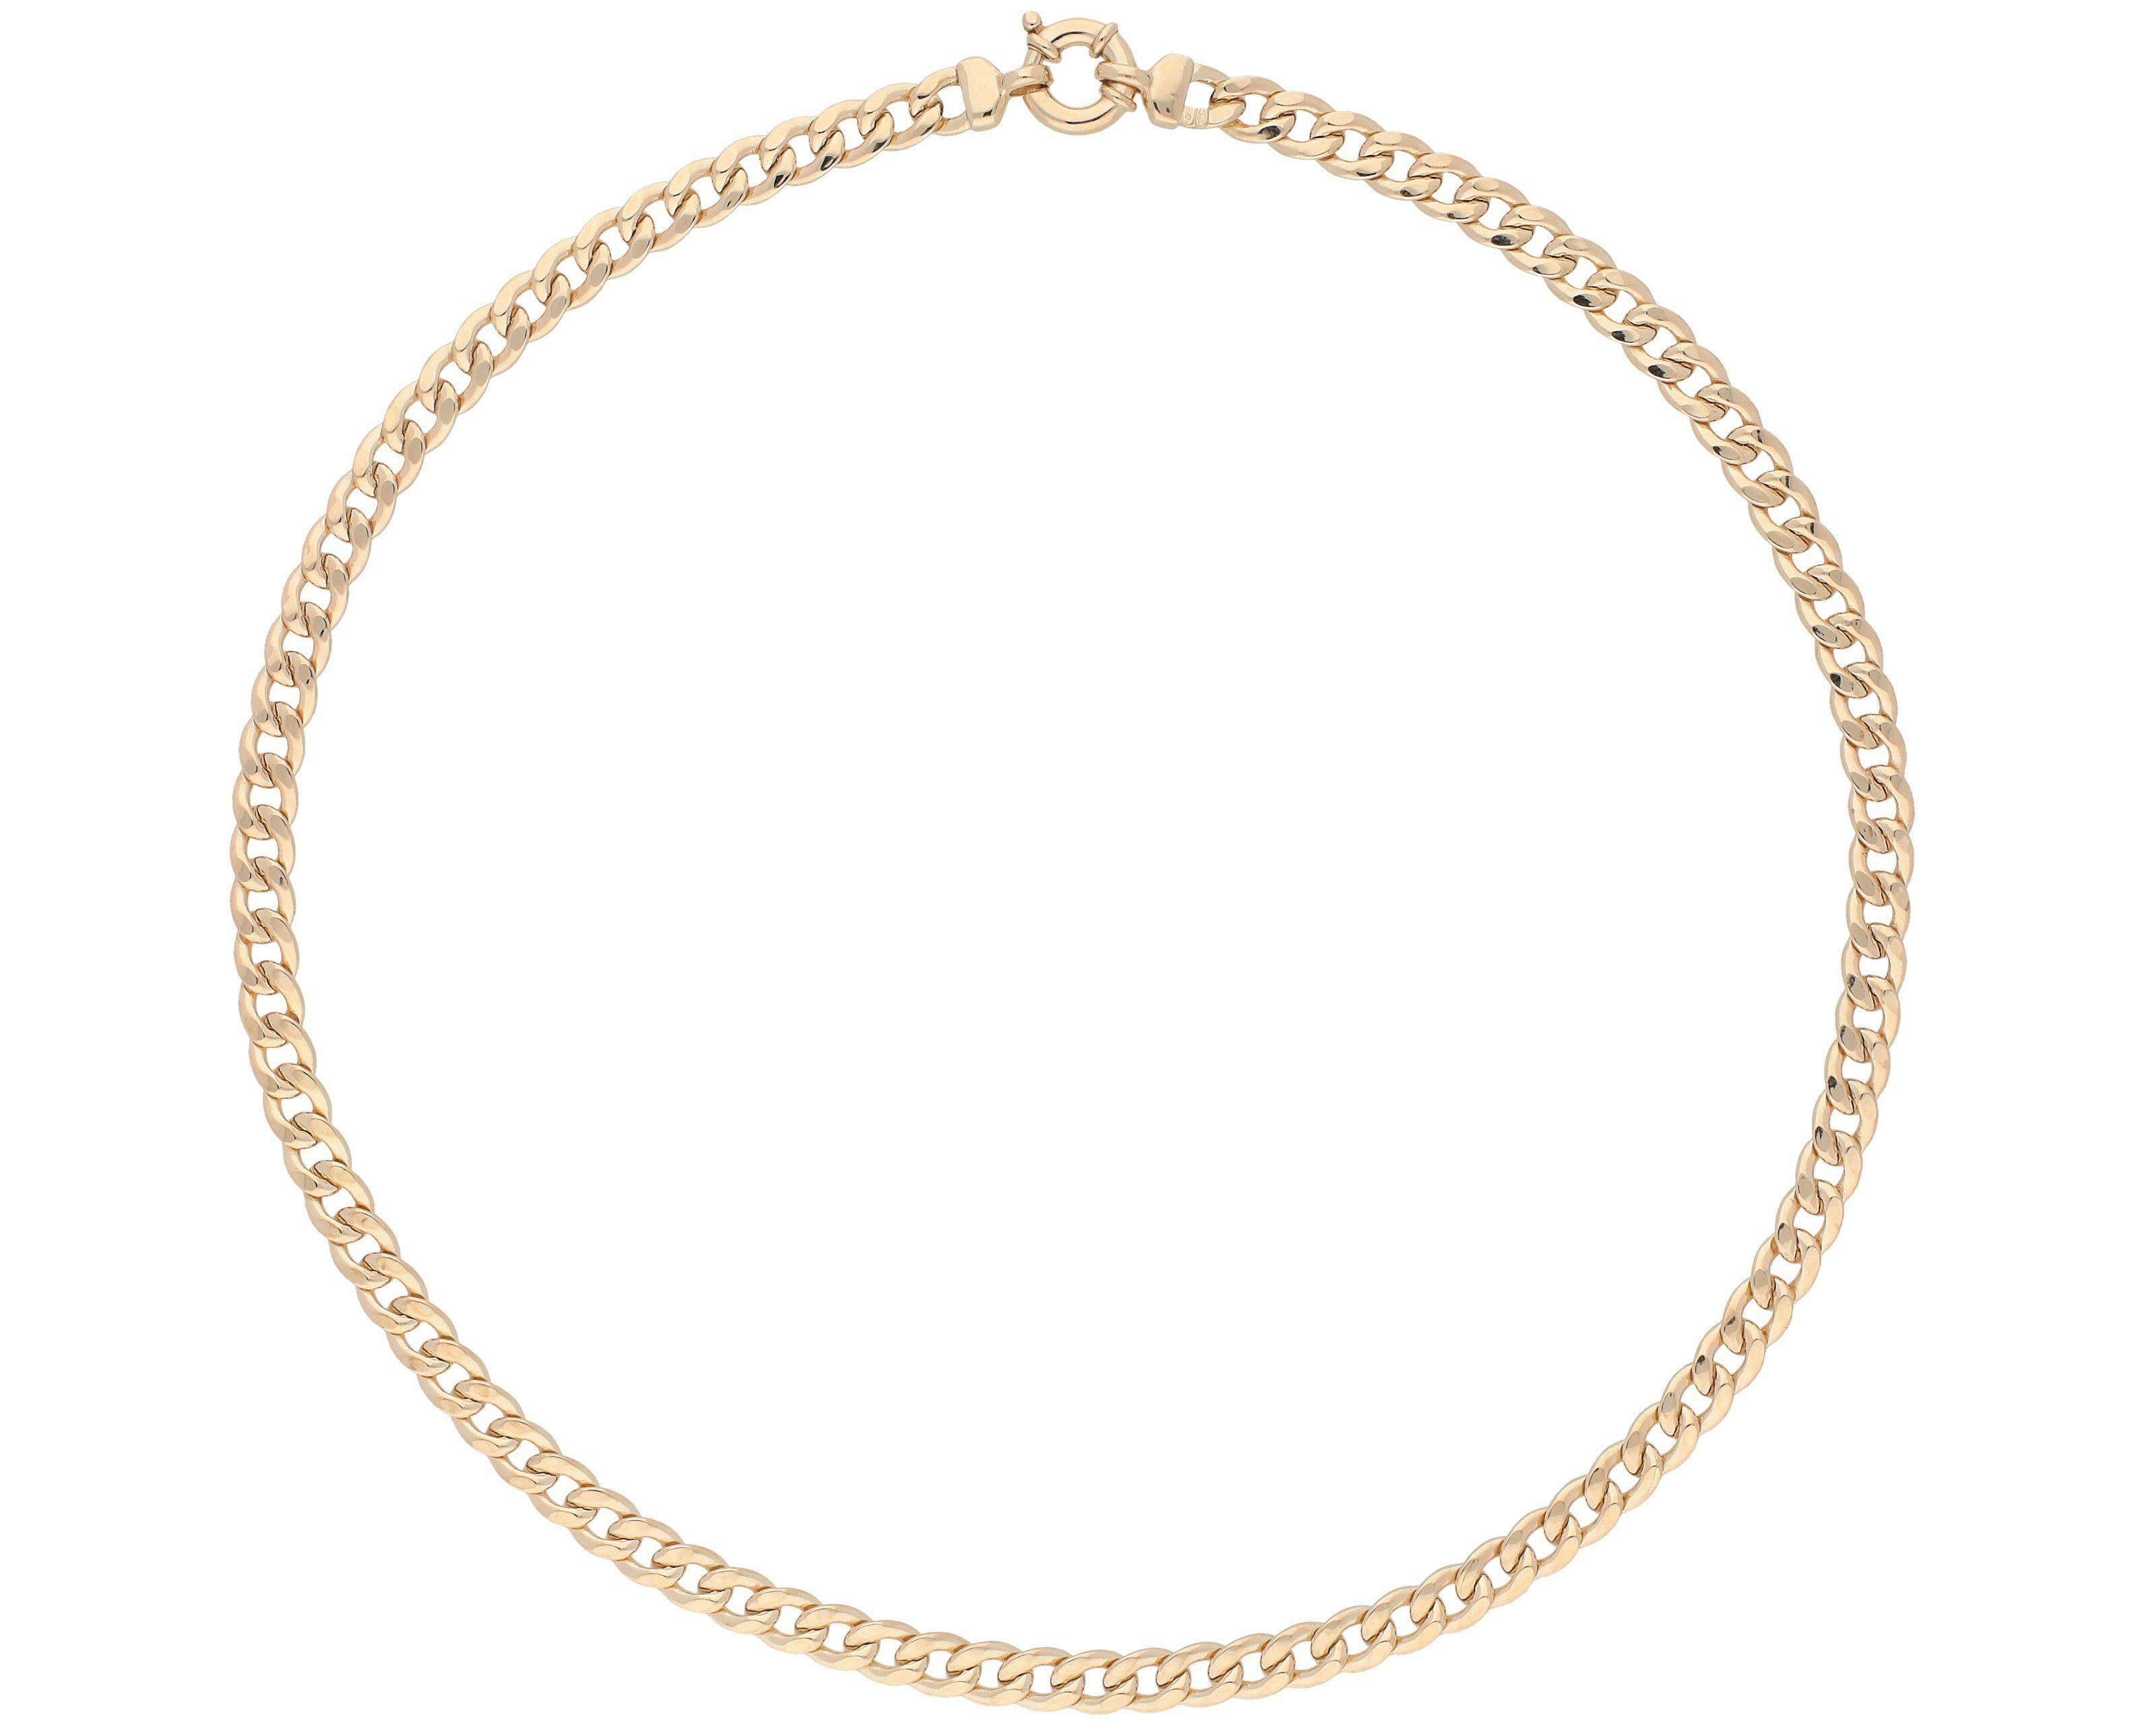 Kaufen »gelbgold« »gelbgold« Vivance Goldkette »gelbgold« Vivance Goldkette Online Goldkette Online Kaufen Vivance v0nwymN8O